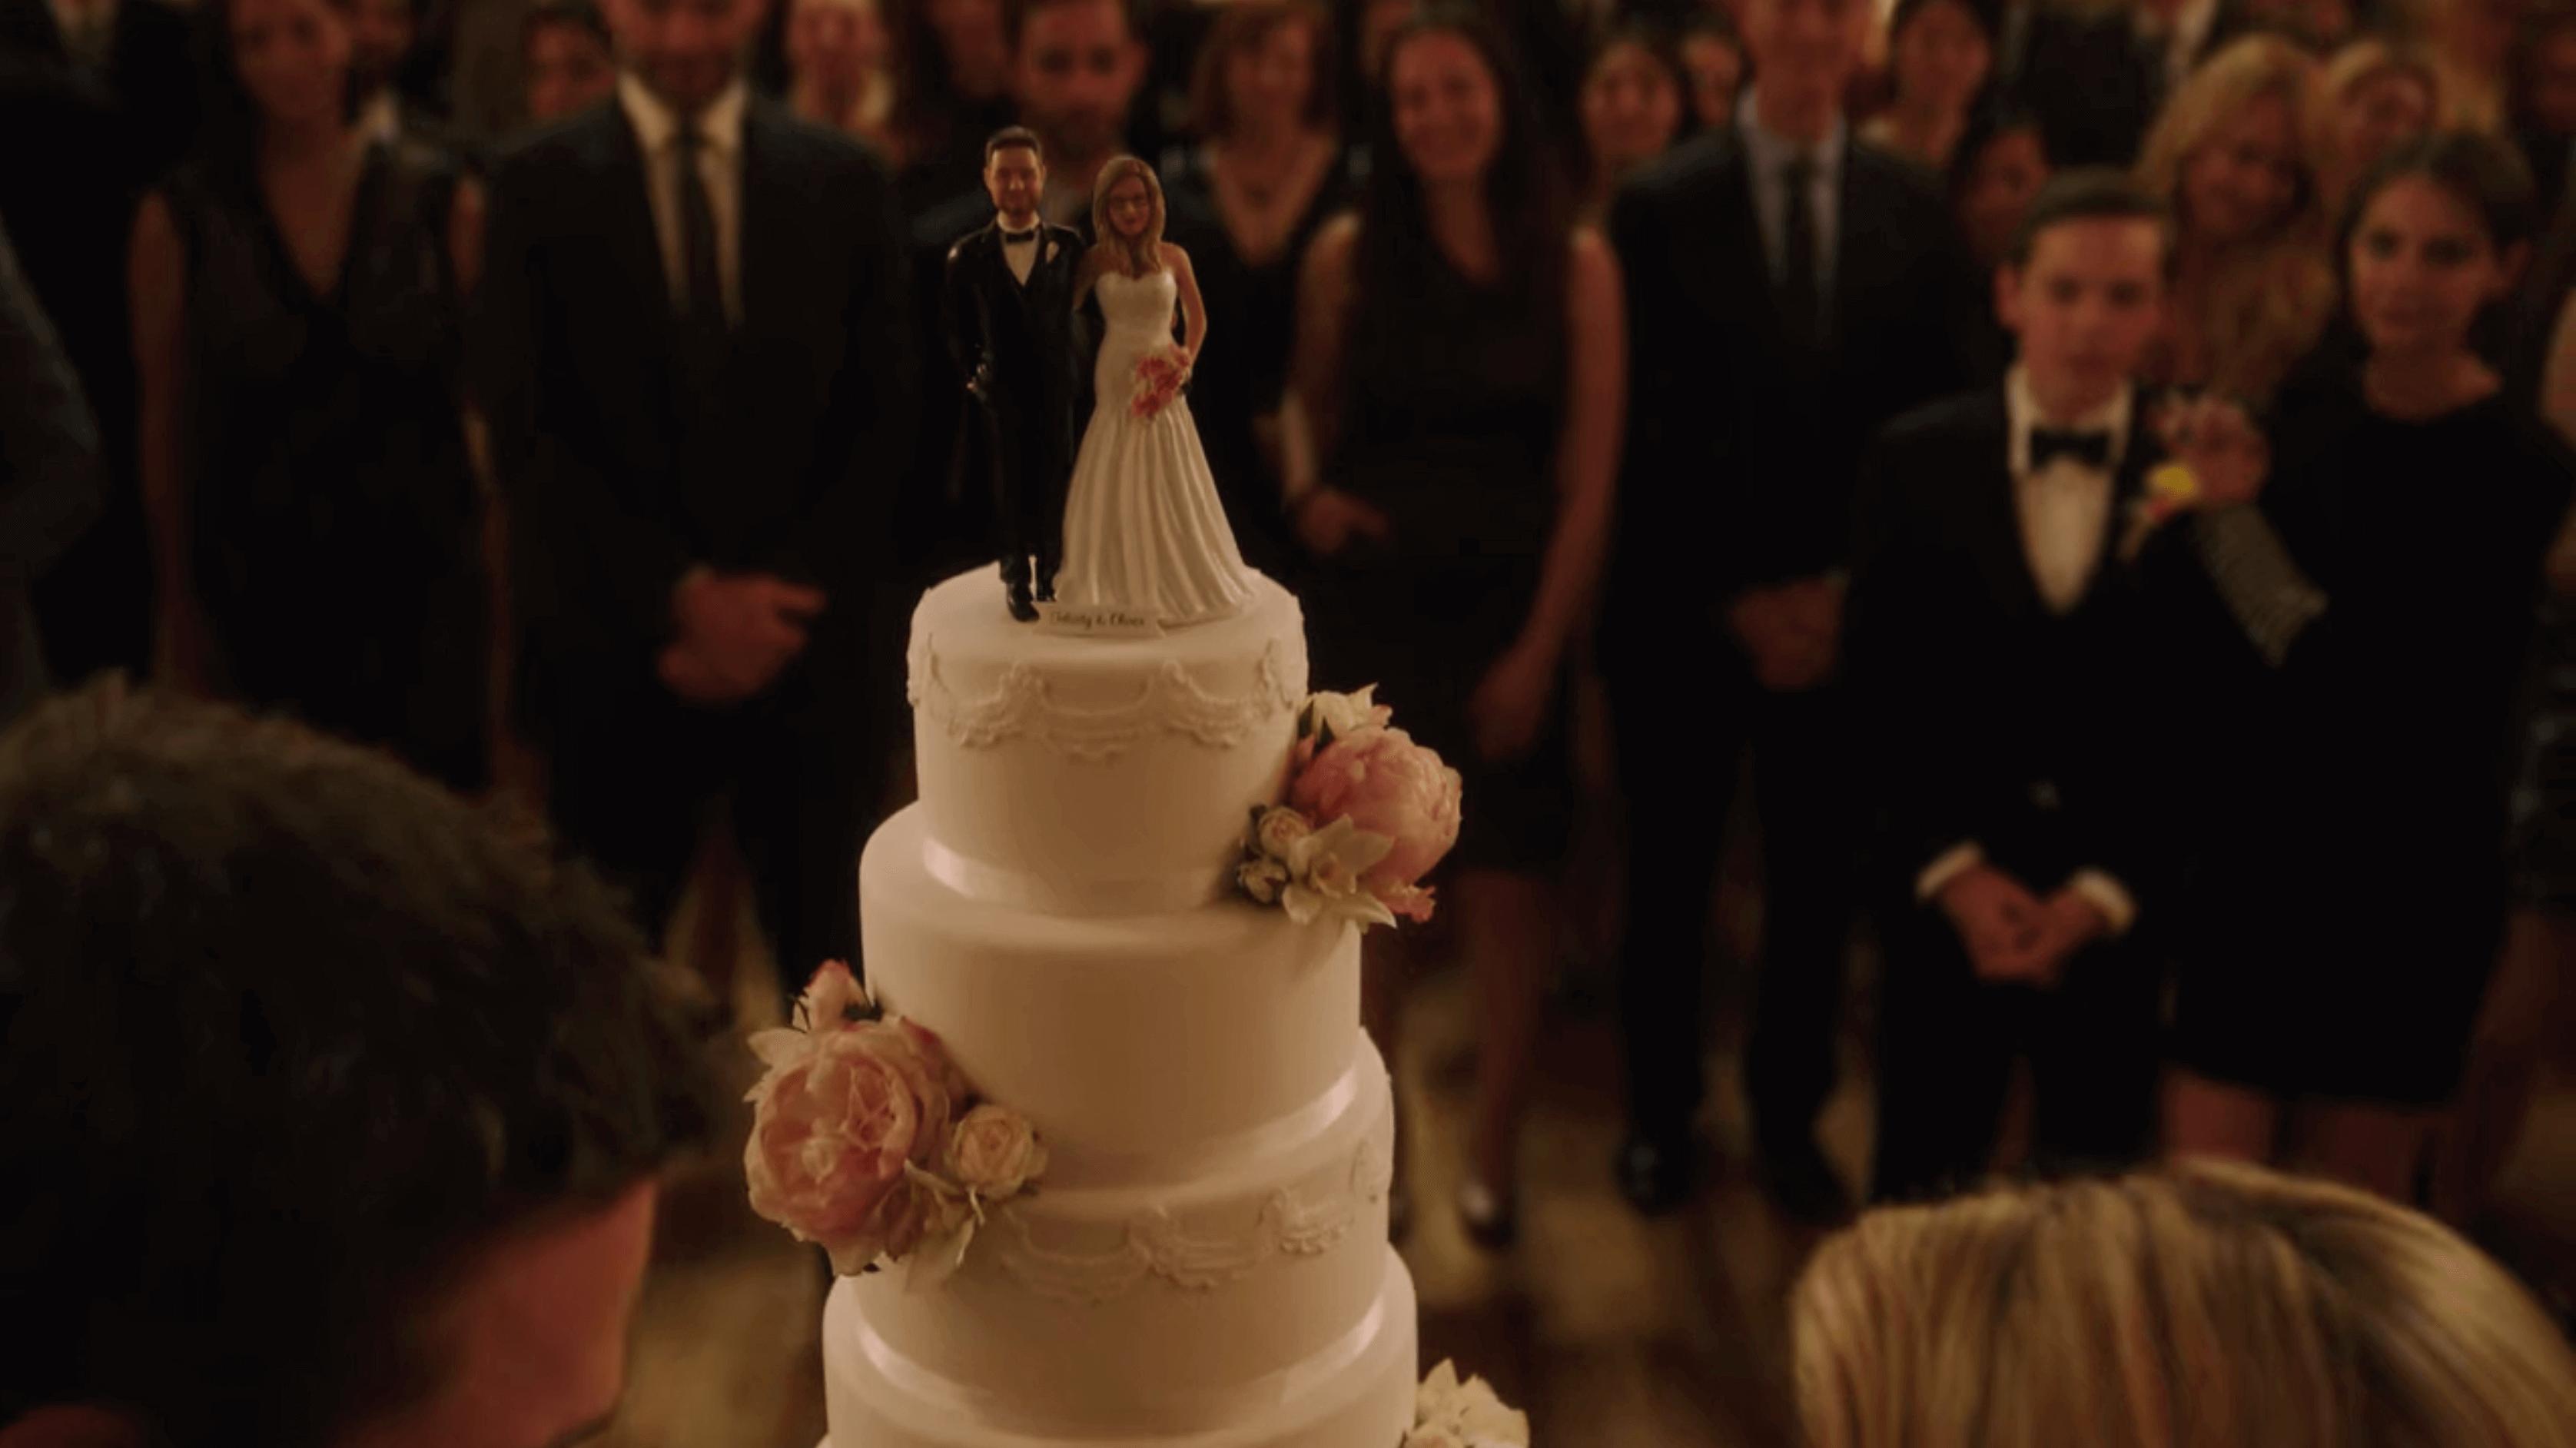 wedding cake topper from Arrow TV show